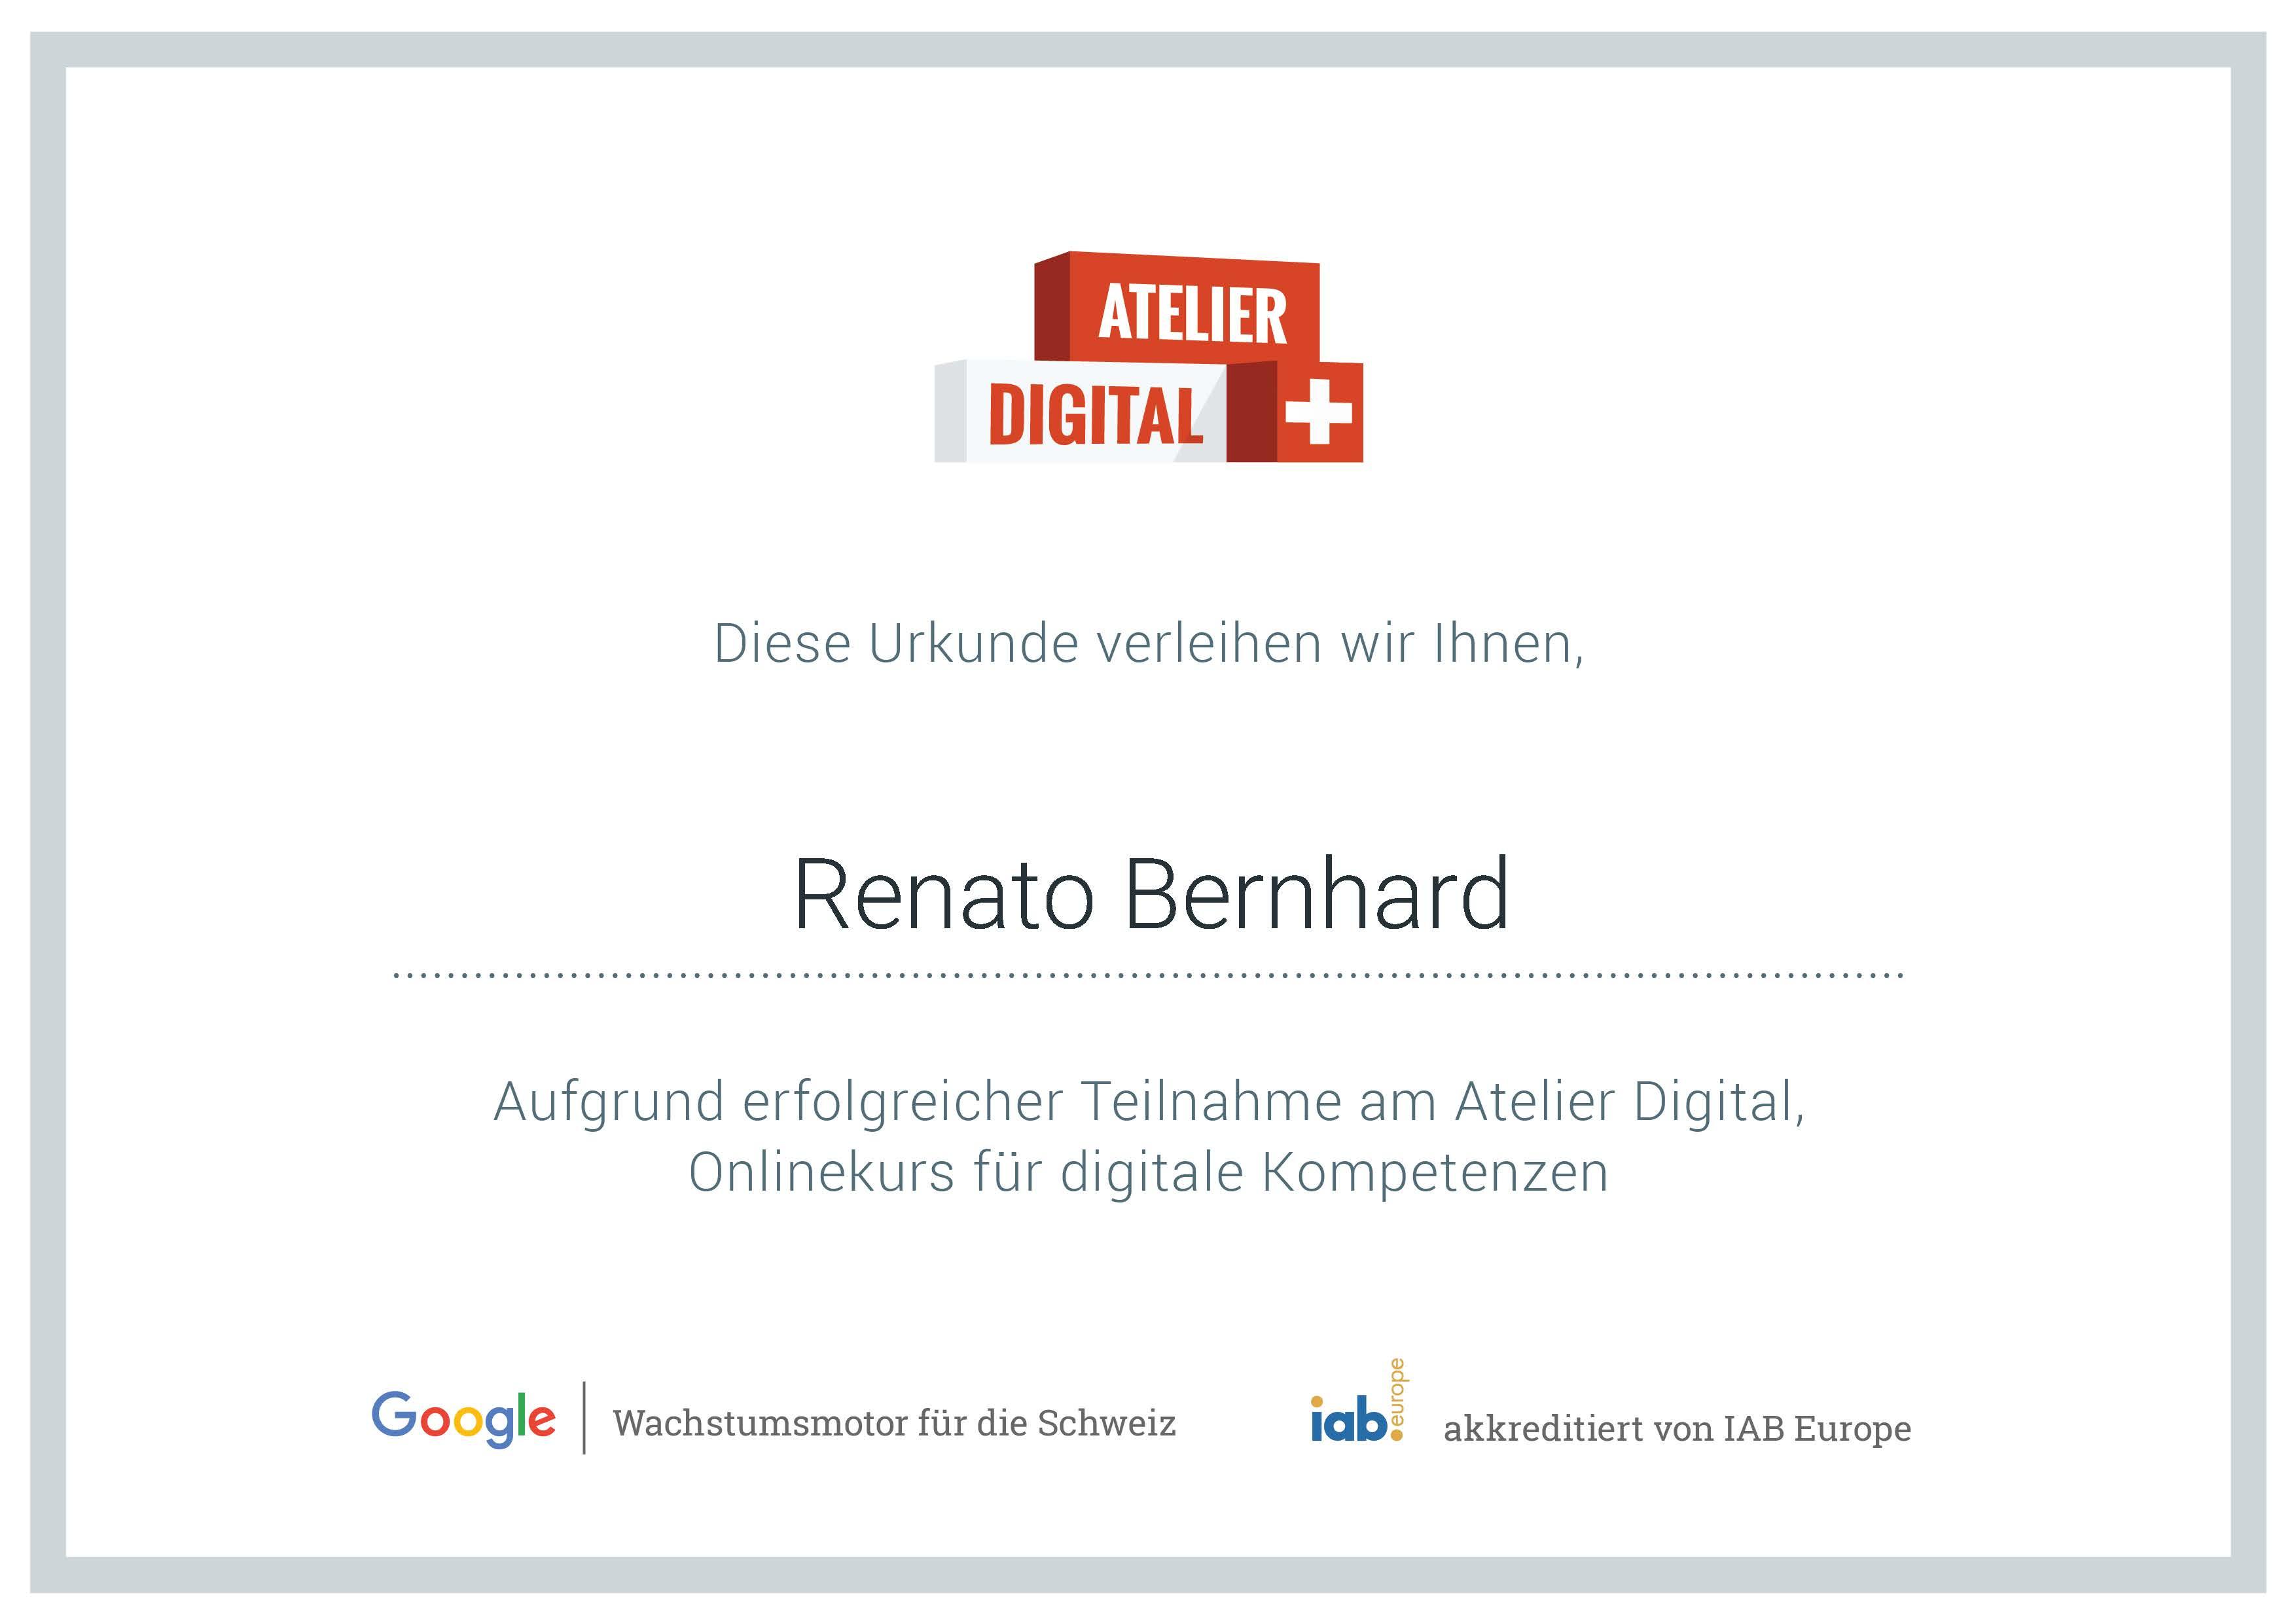 Ziemlich Google Zertifikat Fotos - zertifizierungsstelle ...